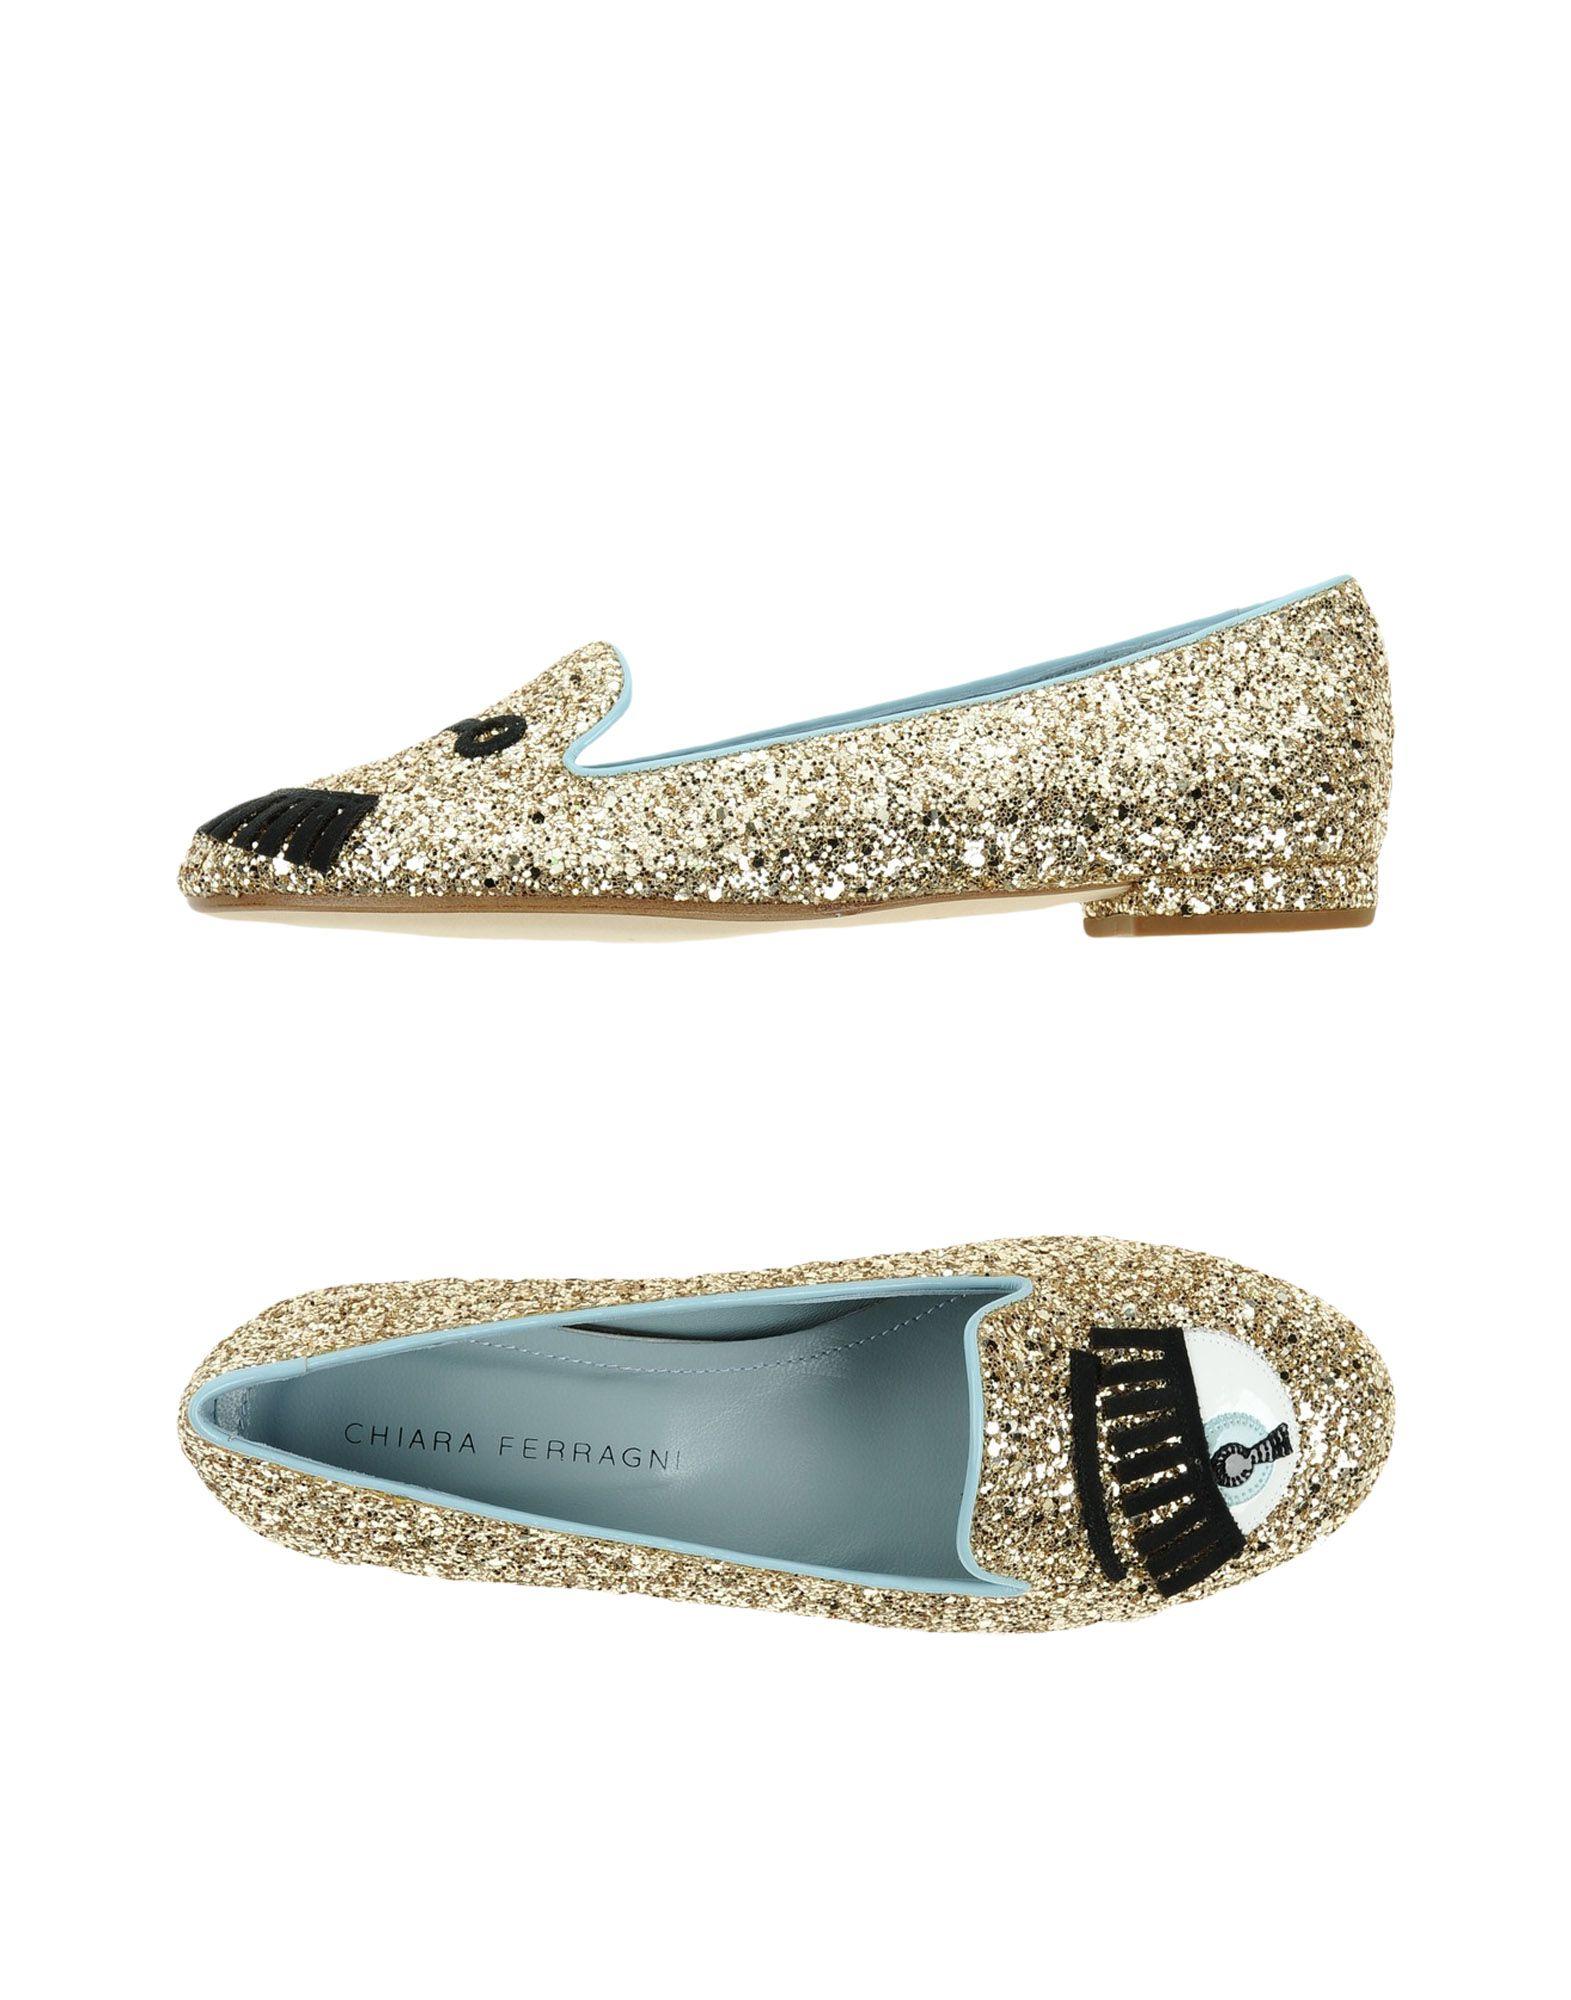 Chiara Damen Ferragni Mokassins Damen Chiara  11336711AJ Gute Qualität beliebte Schuhe 277b18